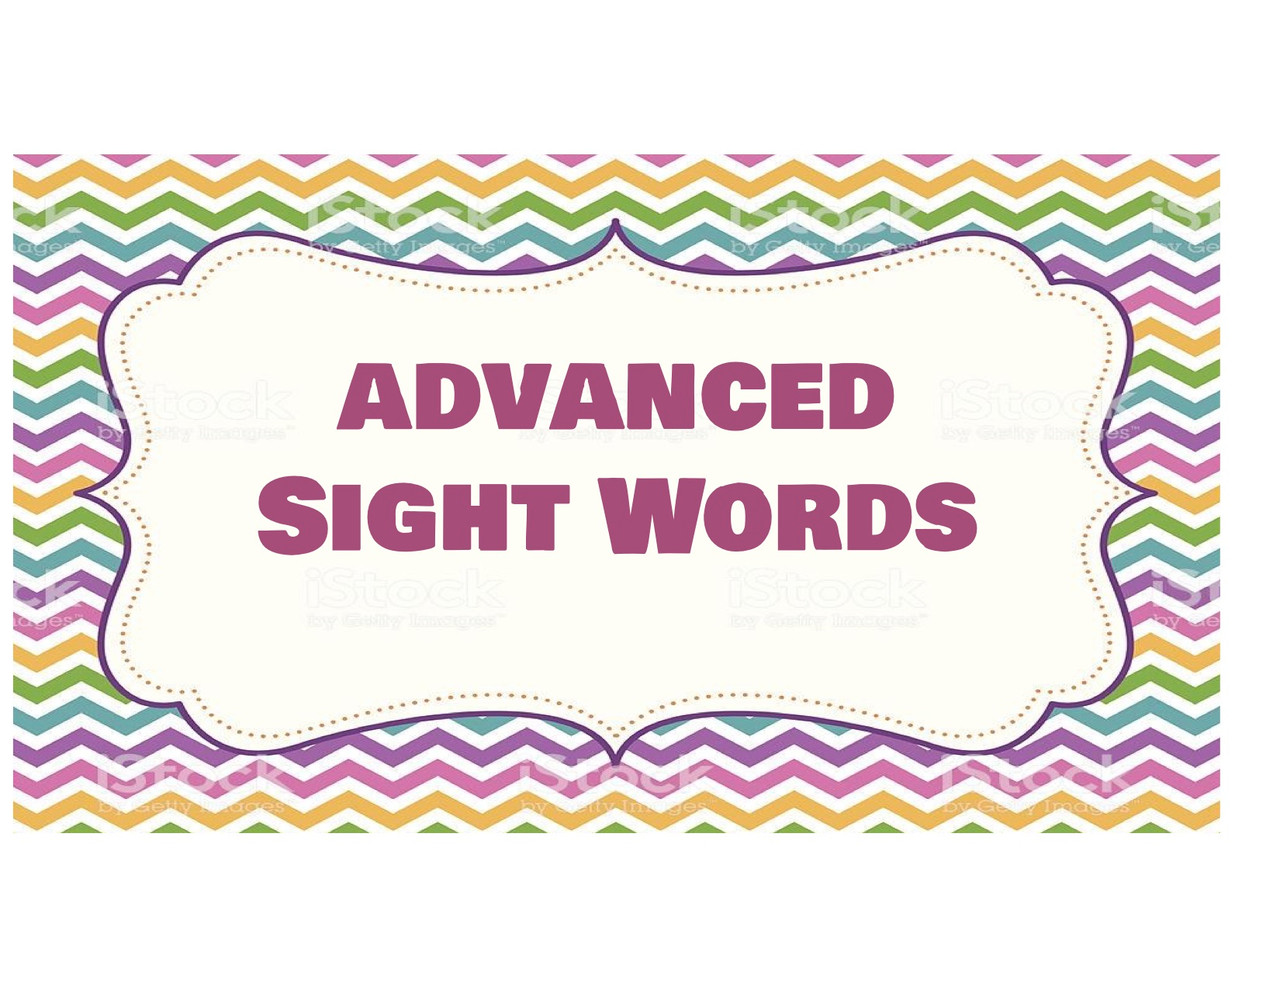 Advanced Sight Words